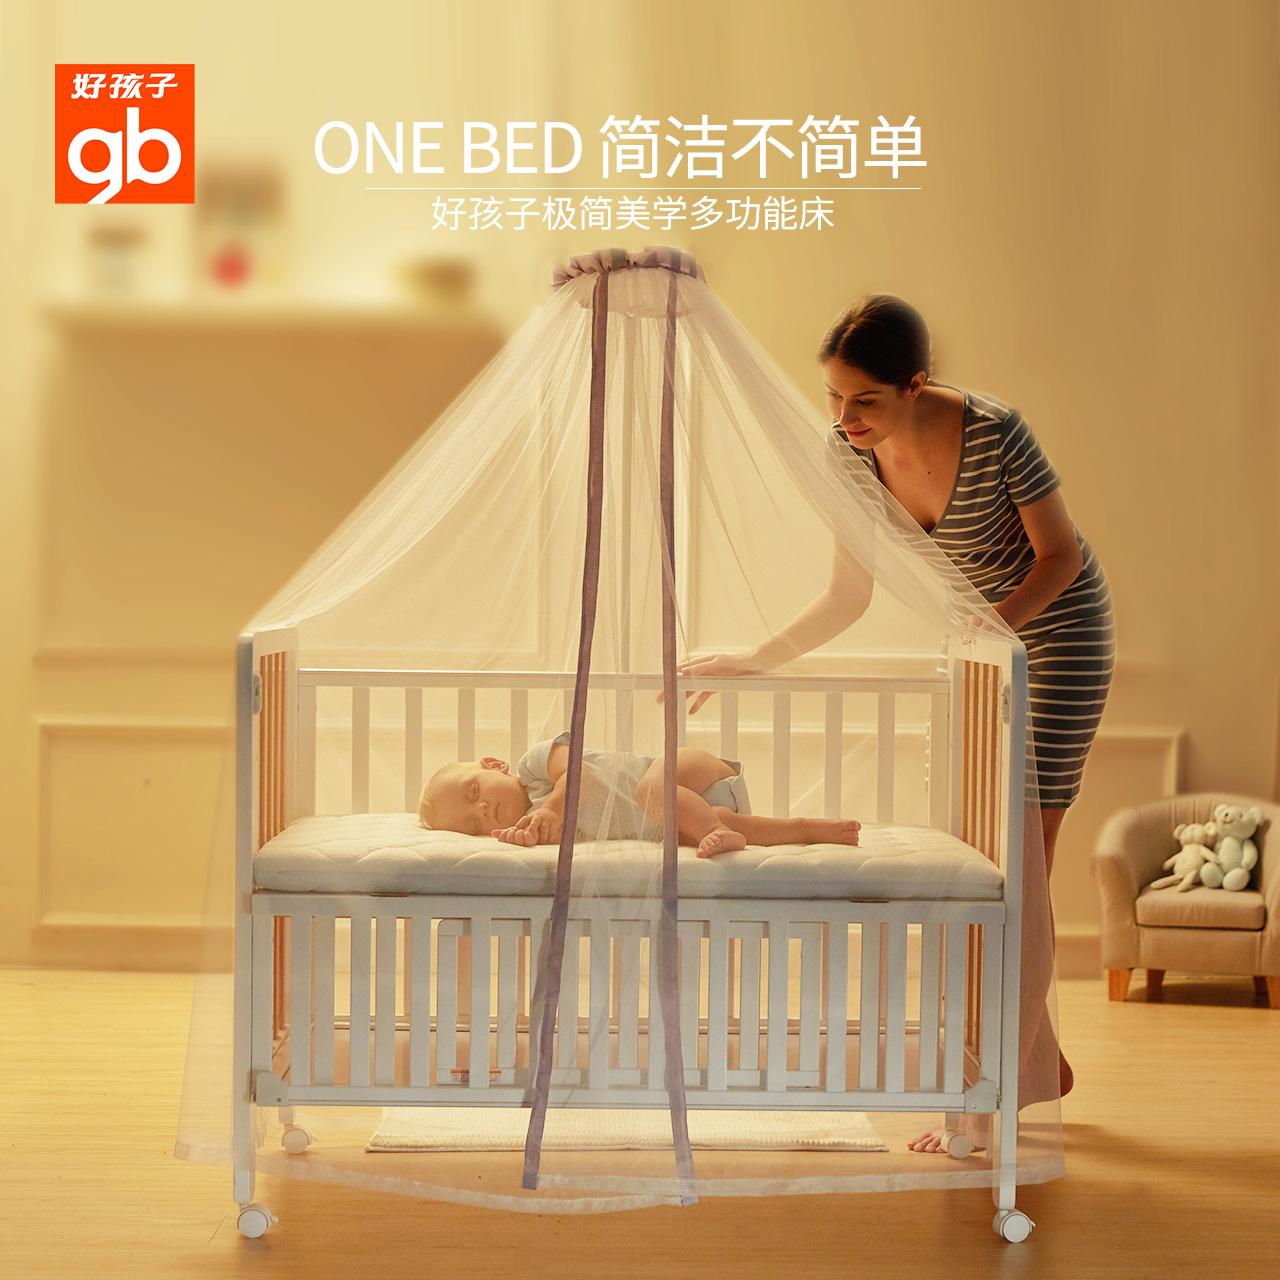 GB καλό παιδί βρεφικό κρεβάτι μωρό μου ξύλινα Ευρωπαϊκή πολυλειτουργική τρία εργαλεία ρυθμιζόμενο κρεβάτι στο παιχνίδι MC295